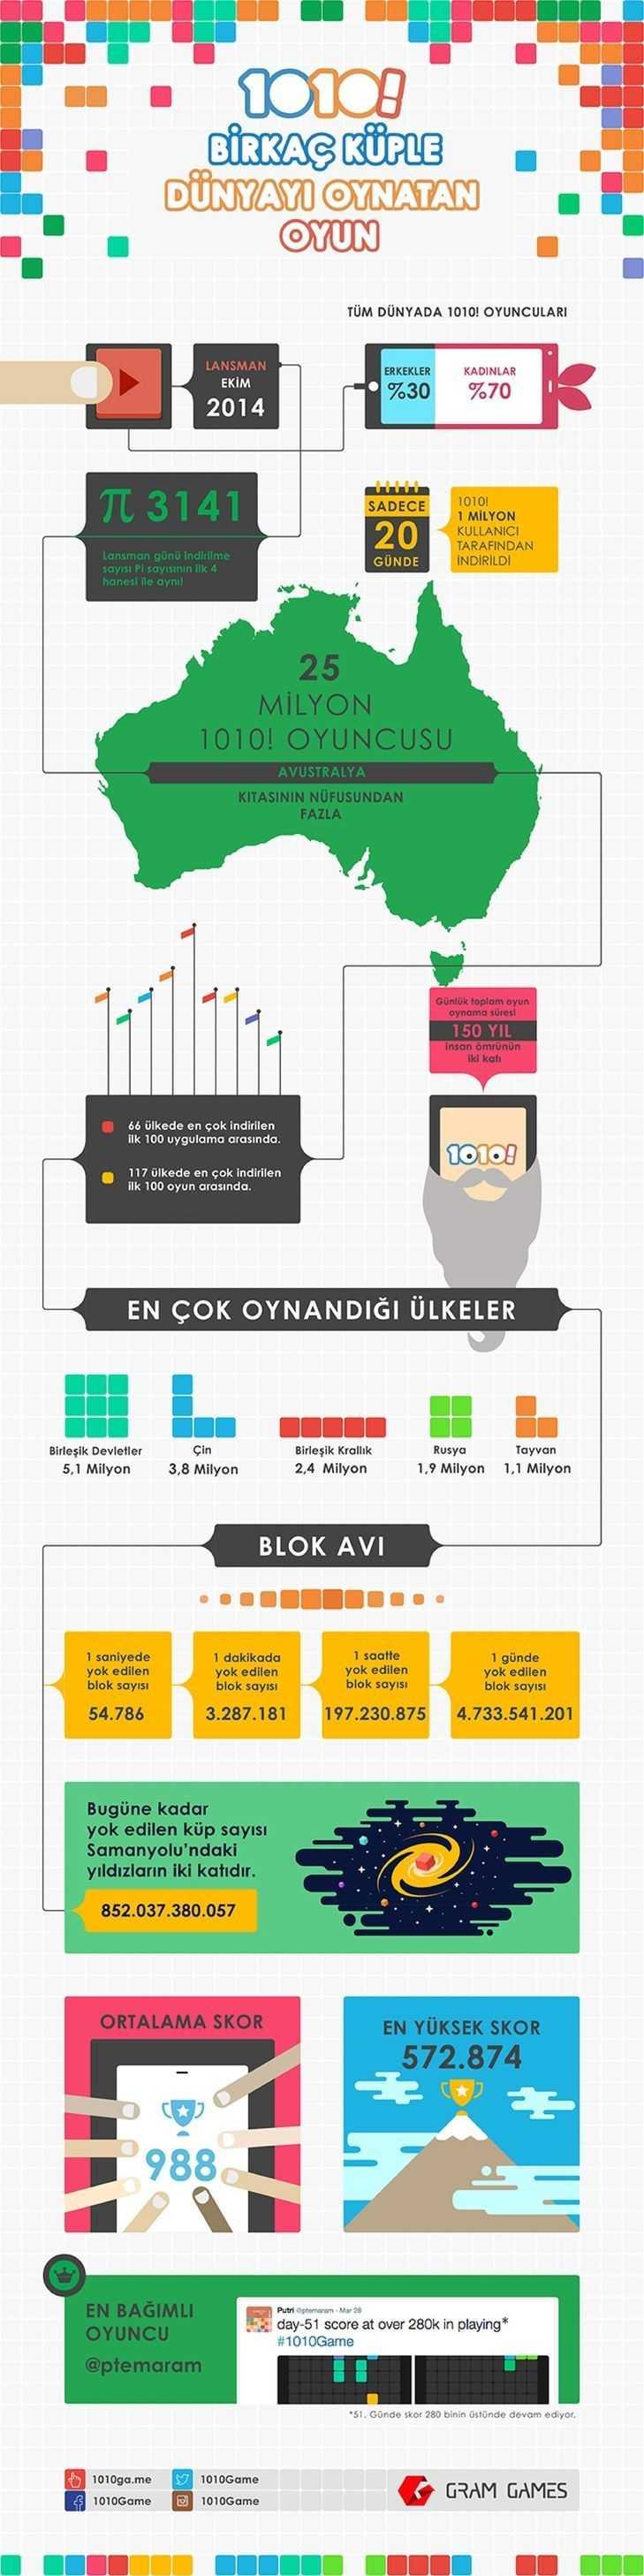 1010 infografik